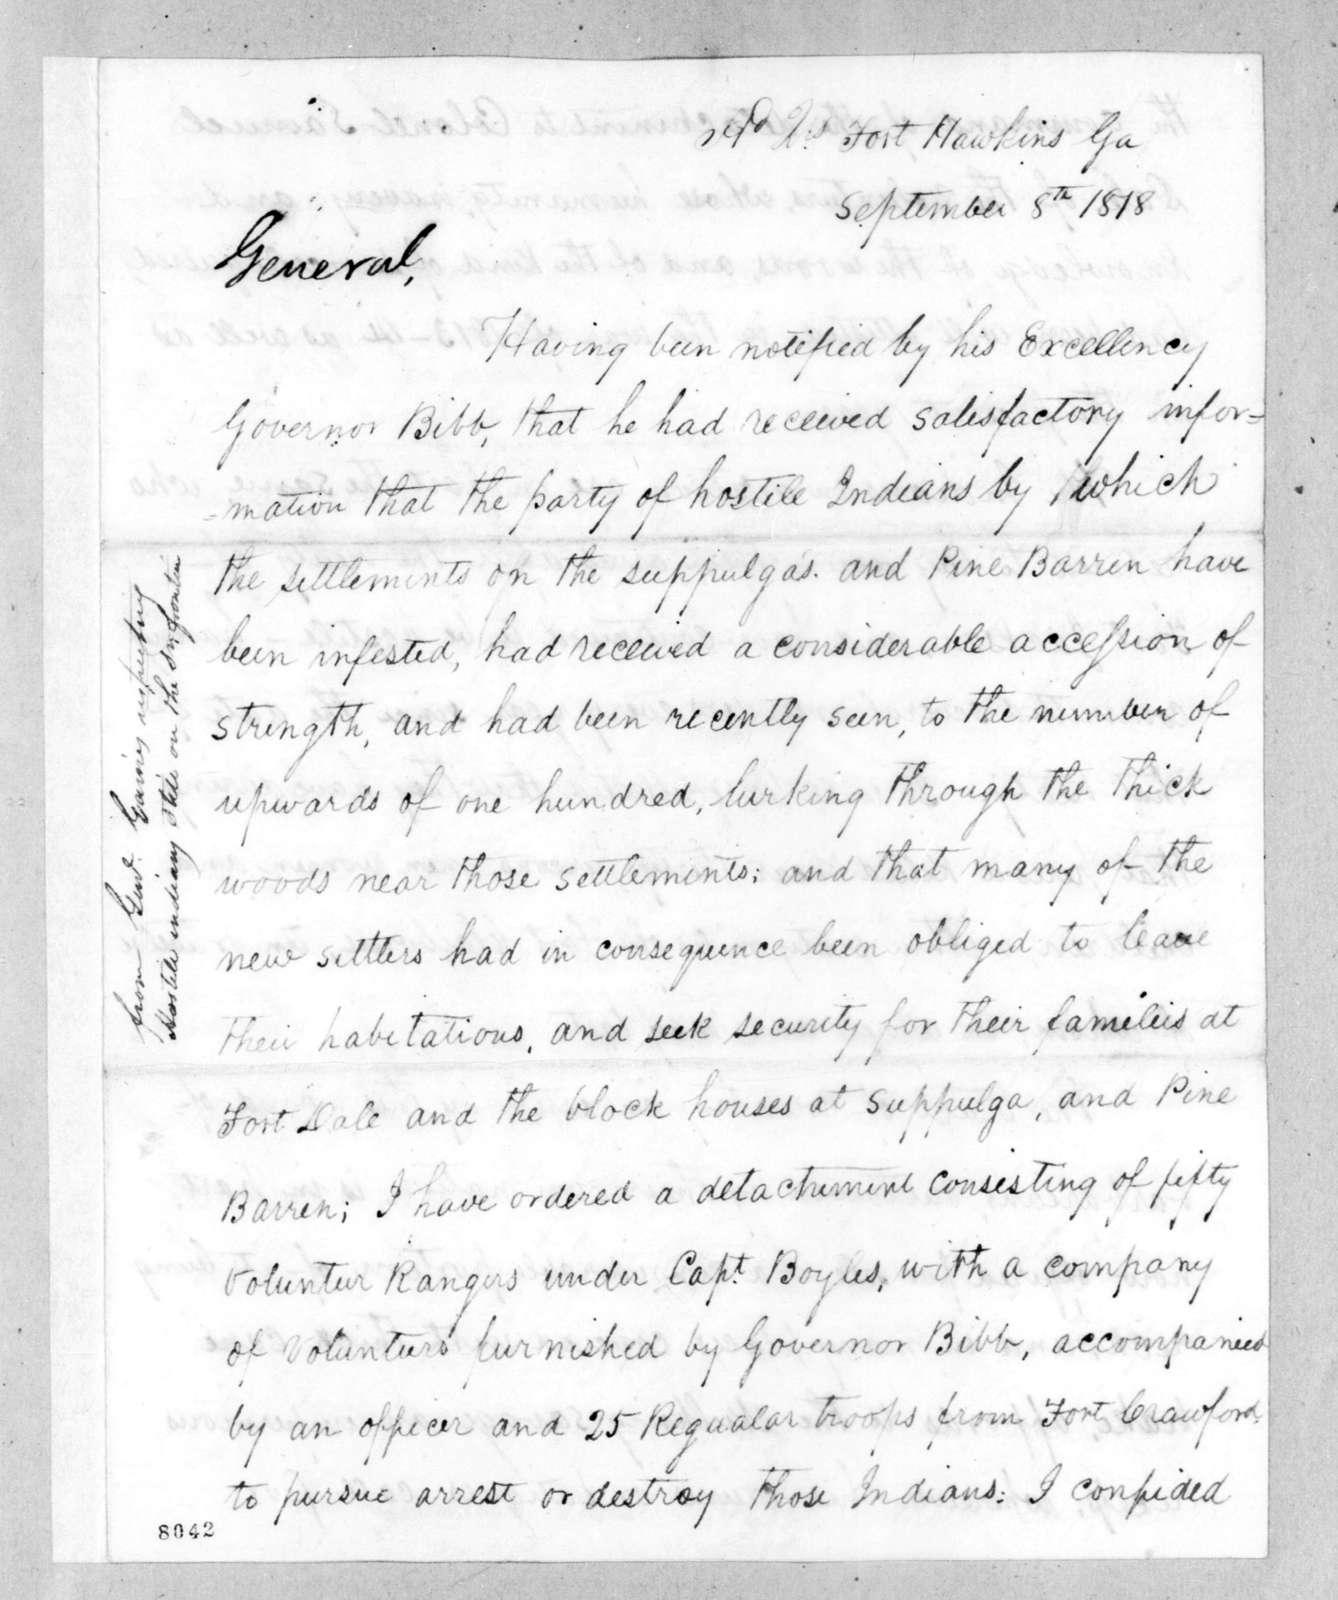 Edmund Pendleton Gaines to Andrew Jackson, September 8, 1818